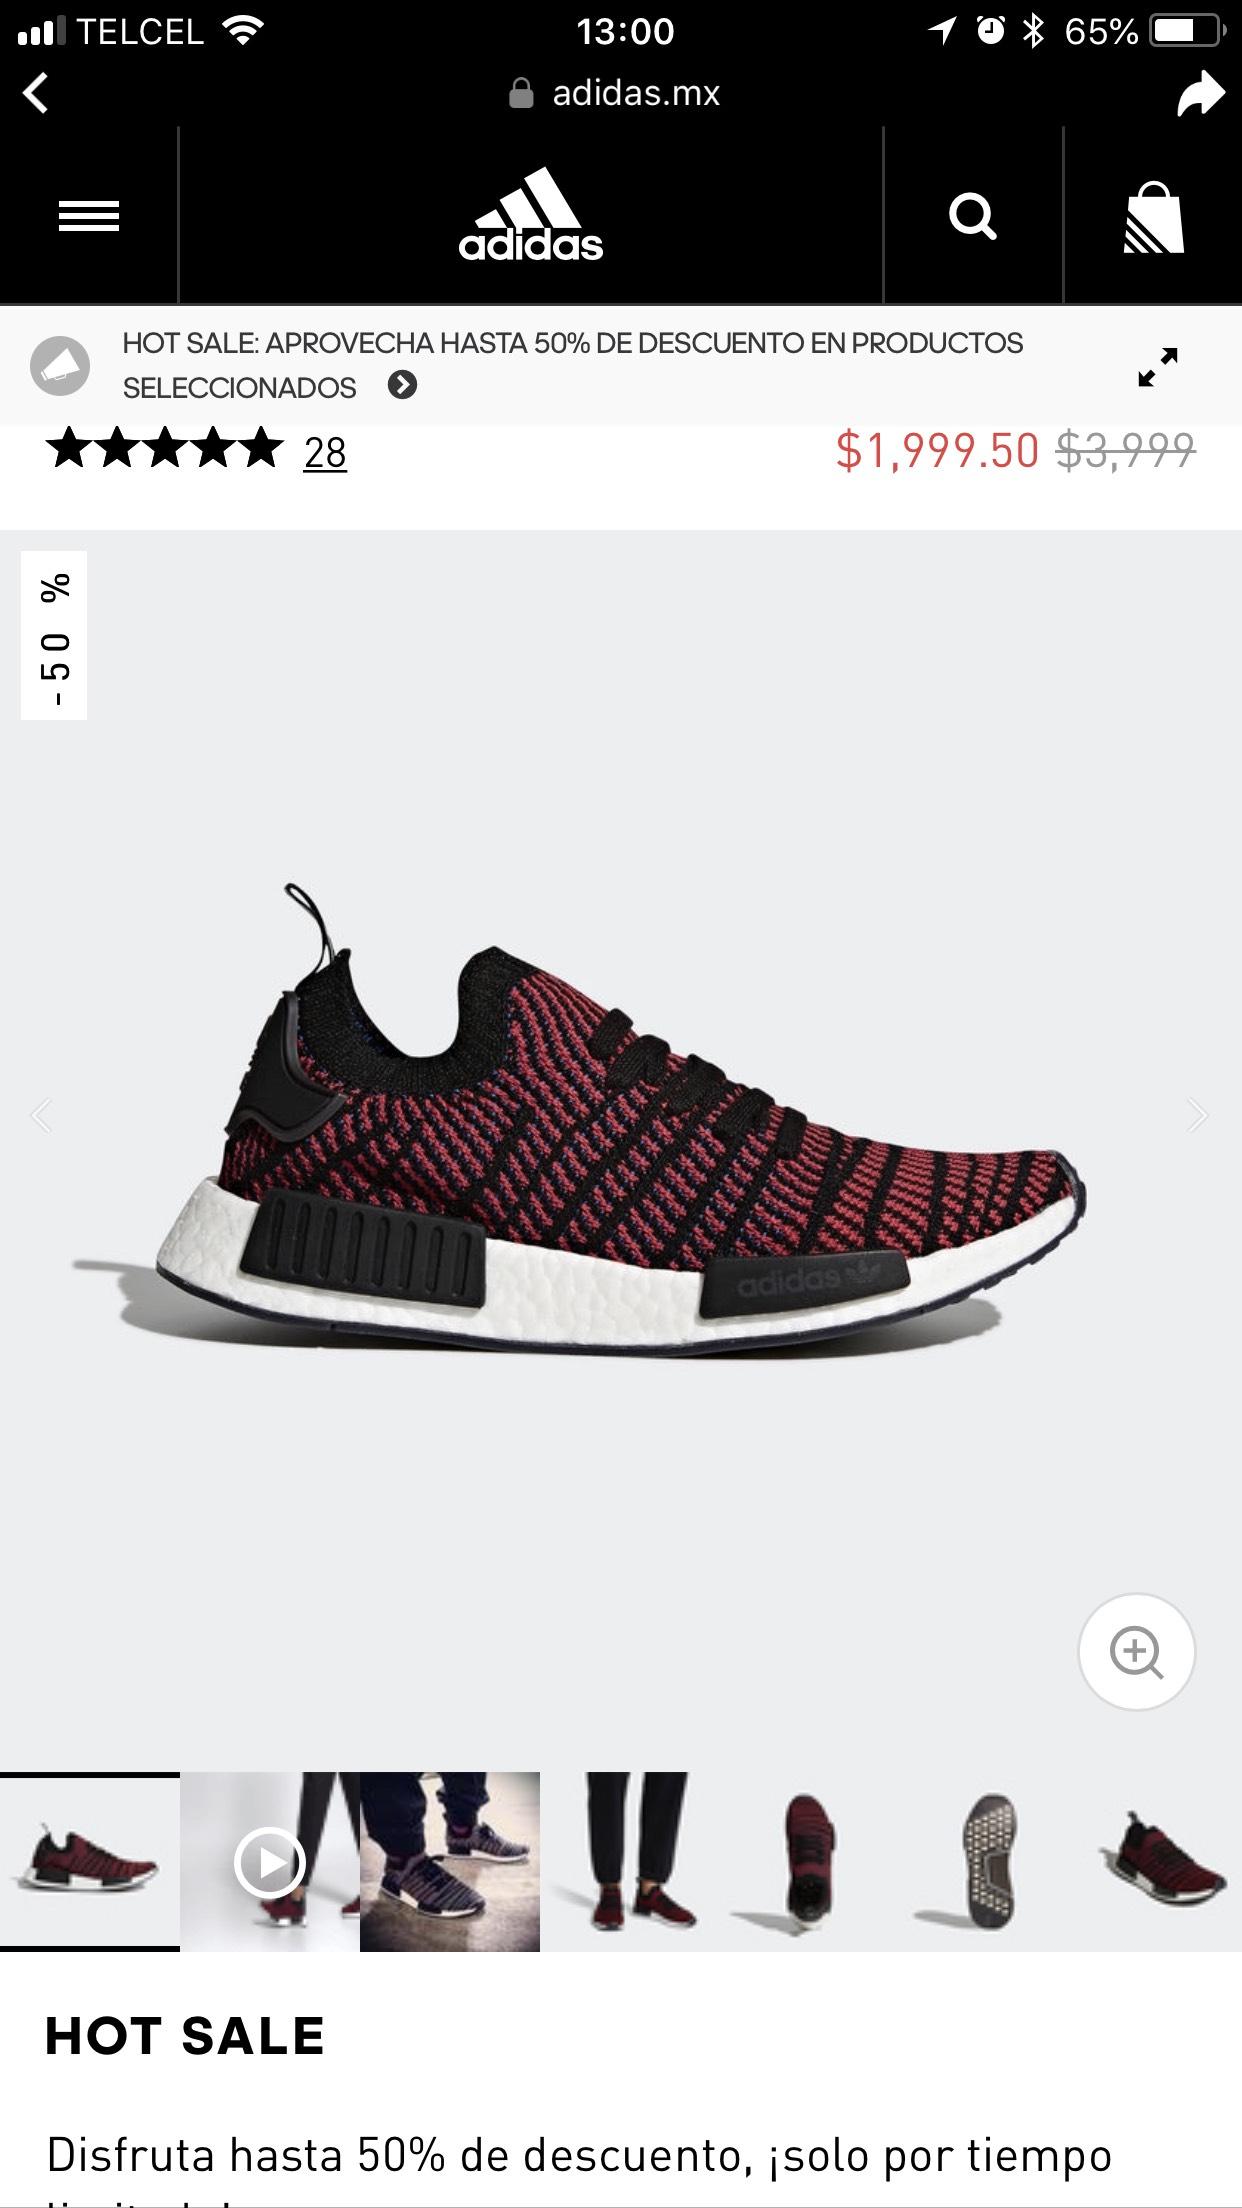 Hot Sale 2018 Adidas: Nmd r1 primeknit